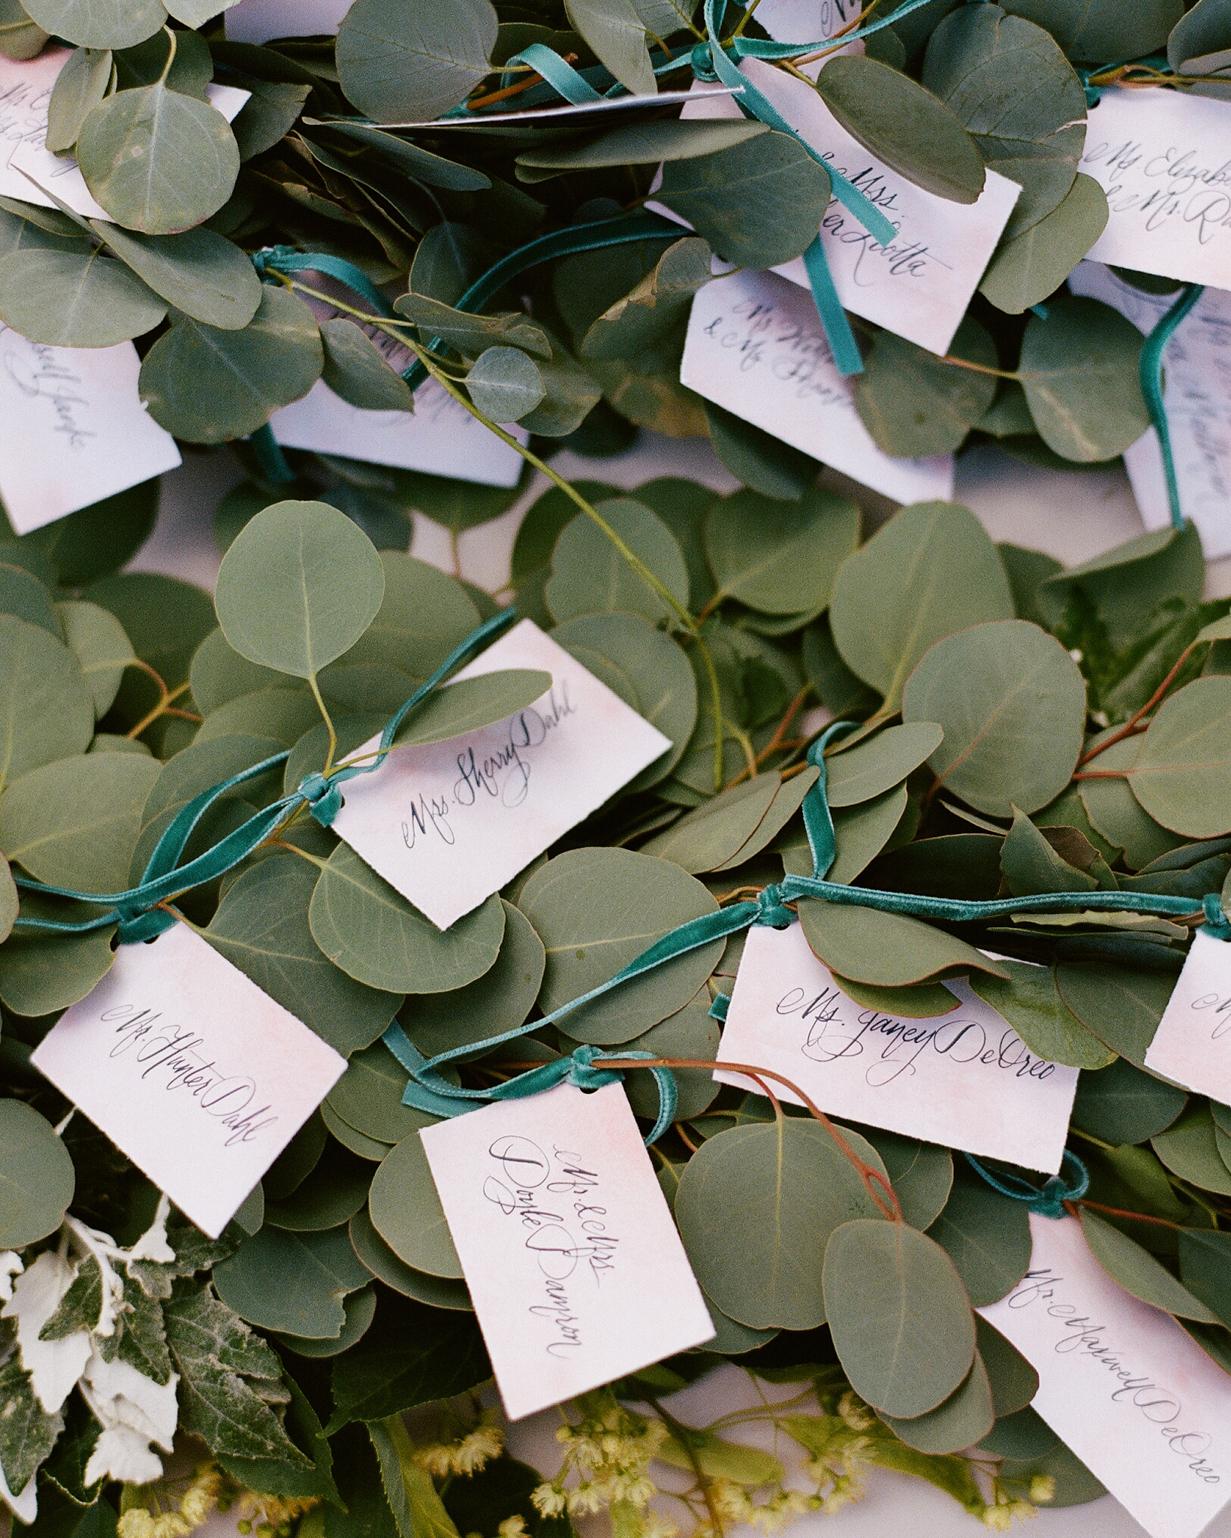 jamie-alex-wedding-escortcards-192-s111544-1014.jpg